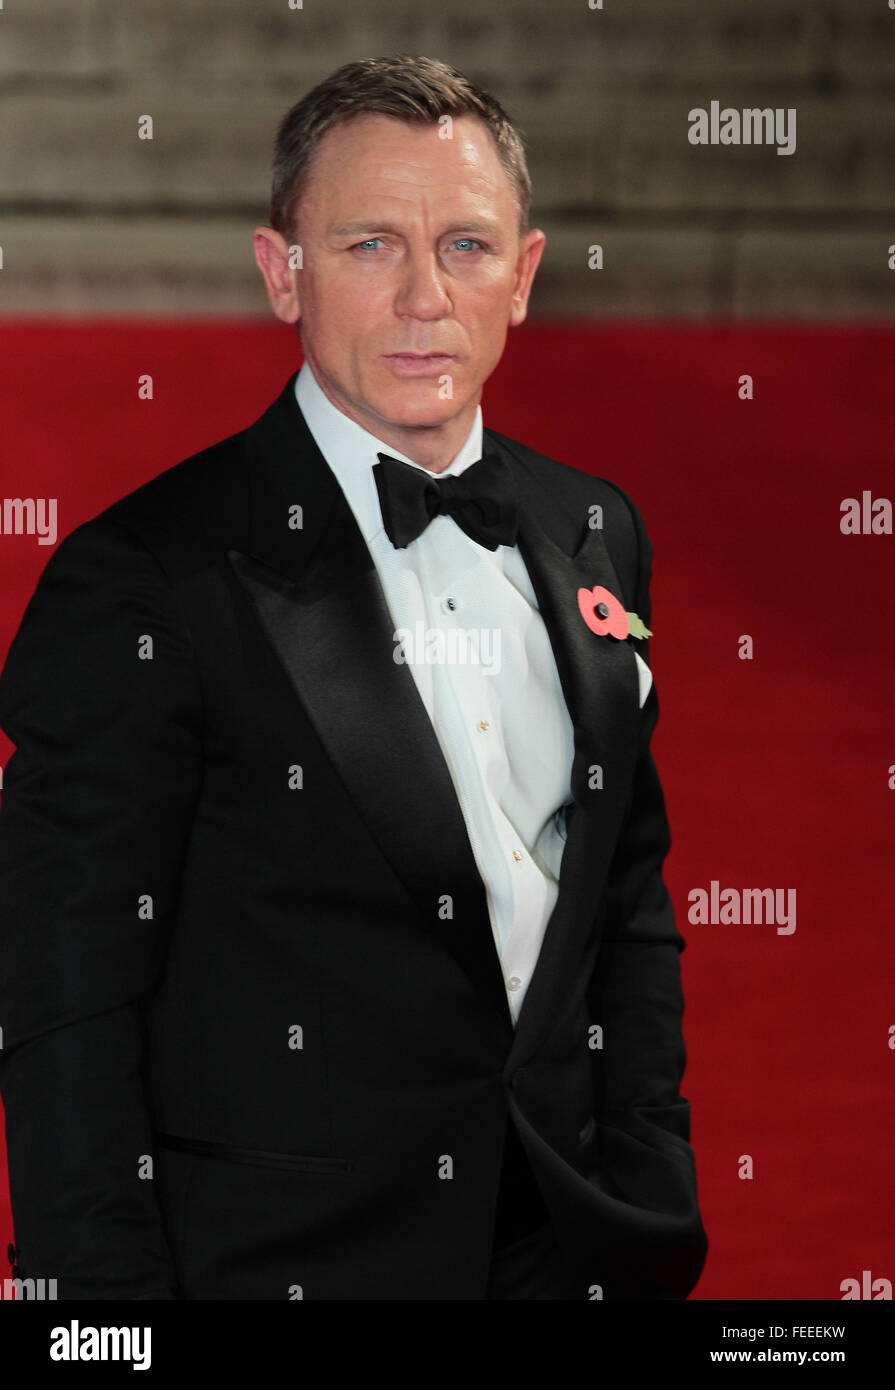 London, UK, 26th Oct 2015: Daniel Craig attends James Bond Spectre CTBF film premiere in London - Stock Image